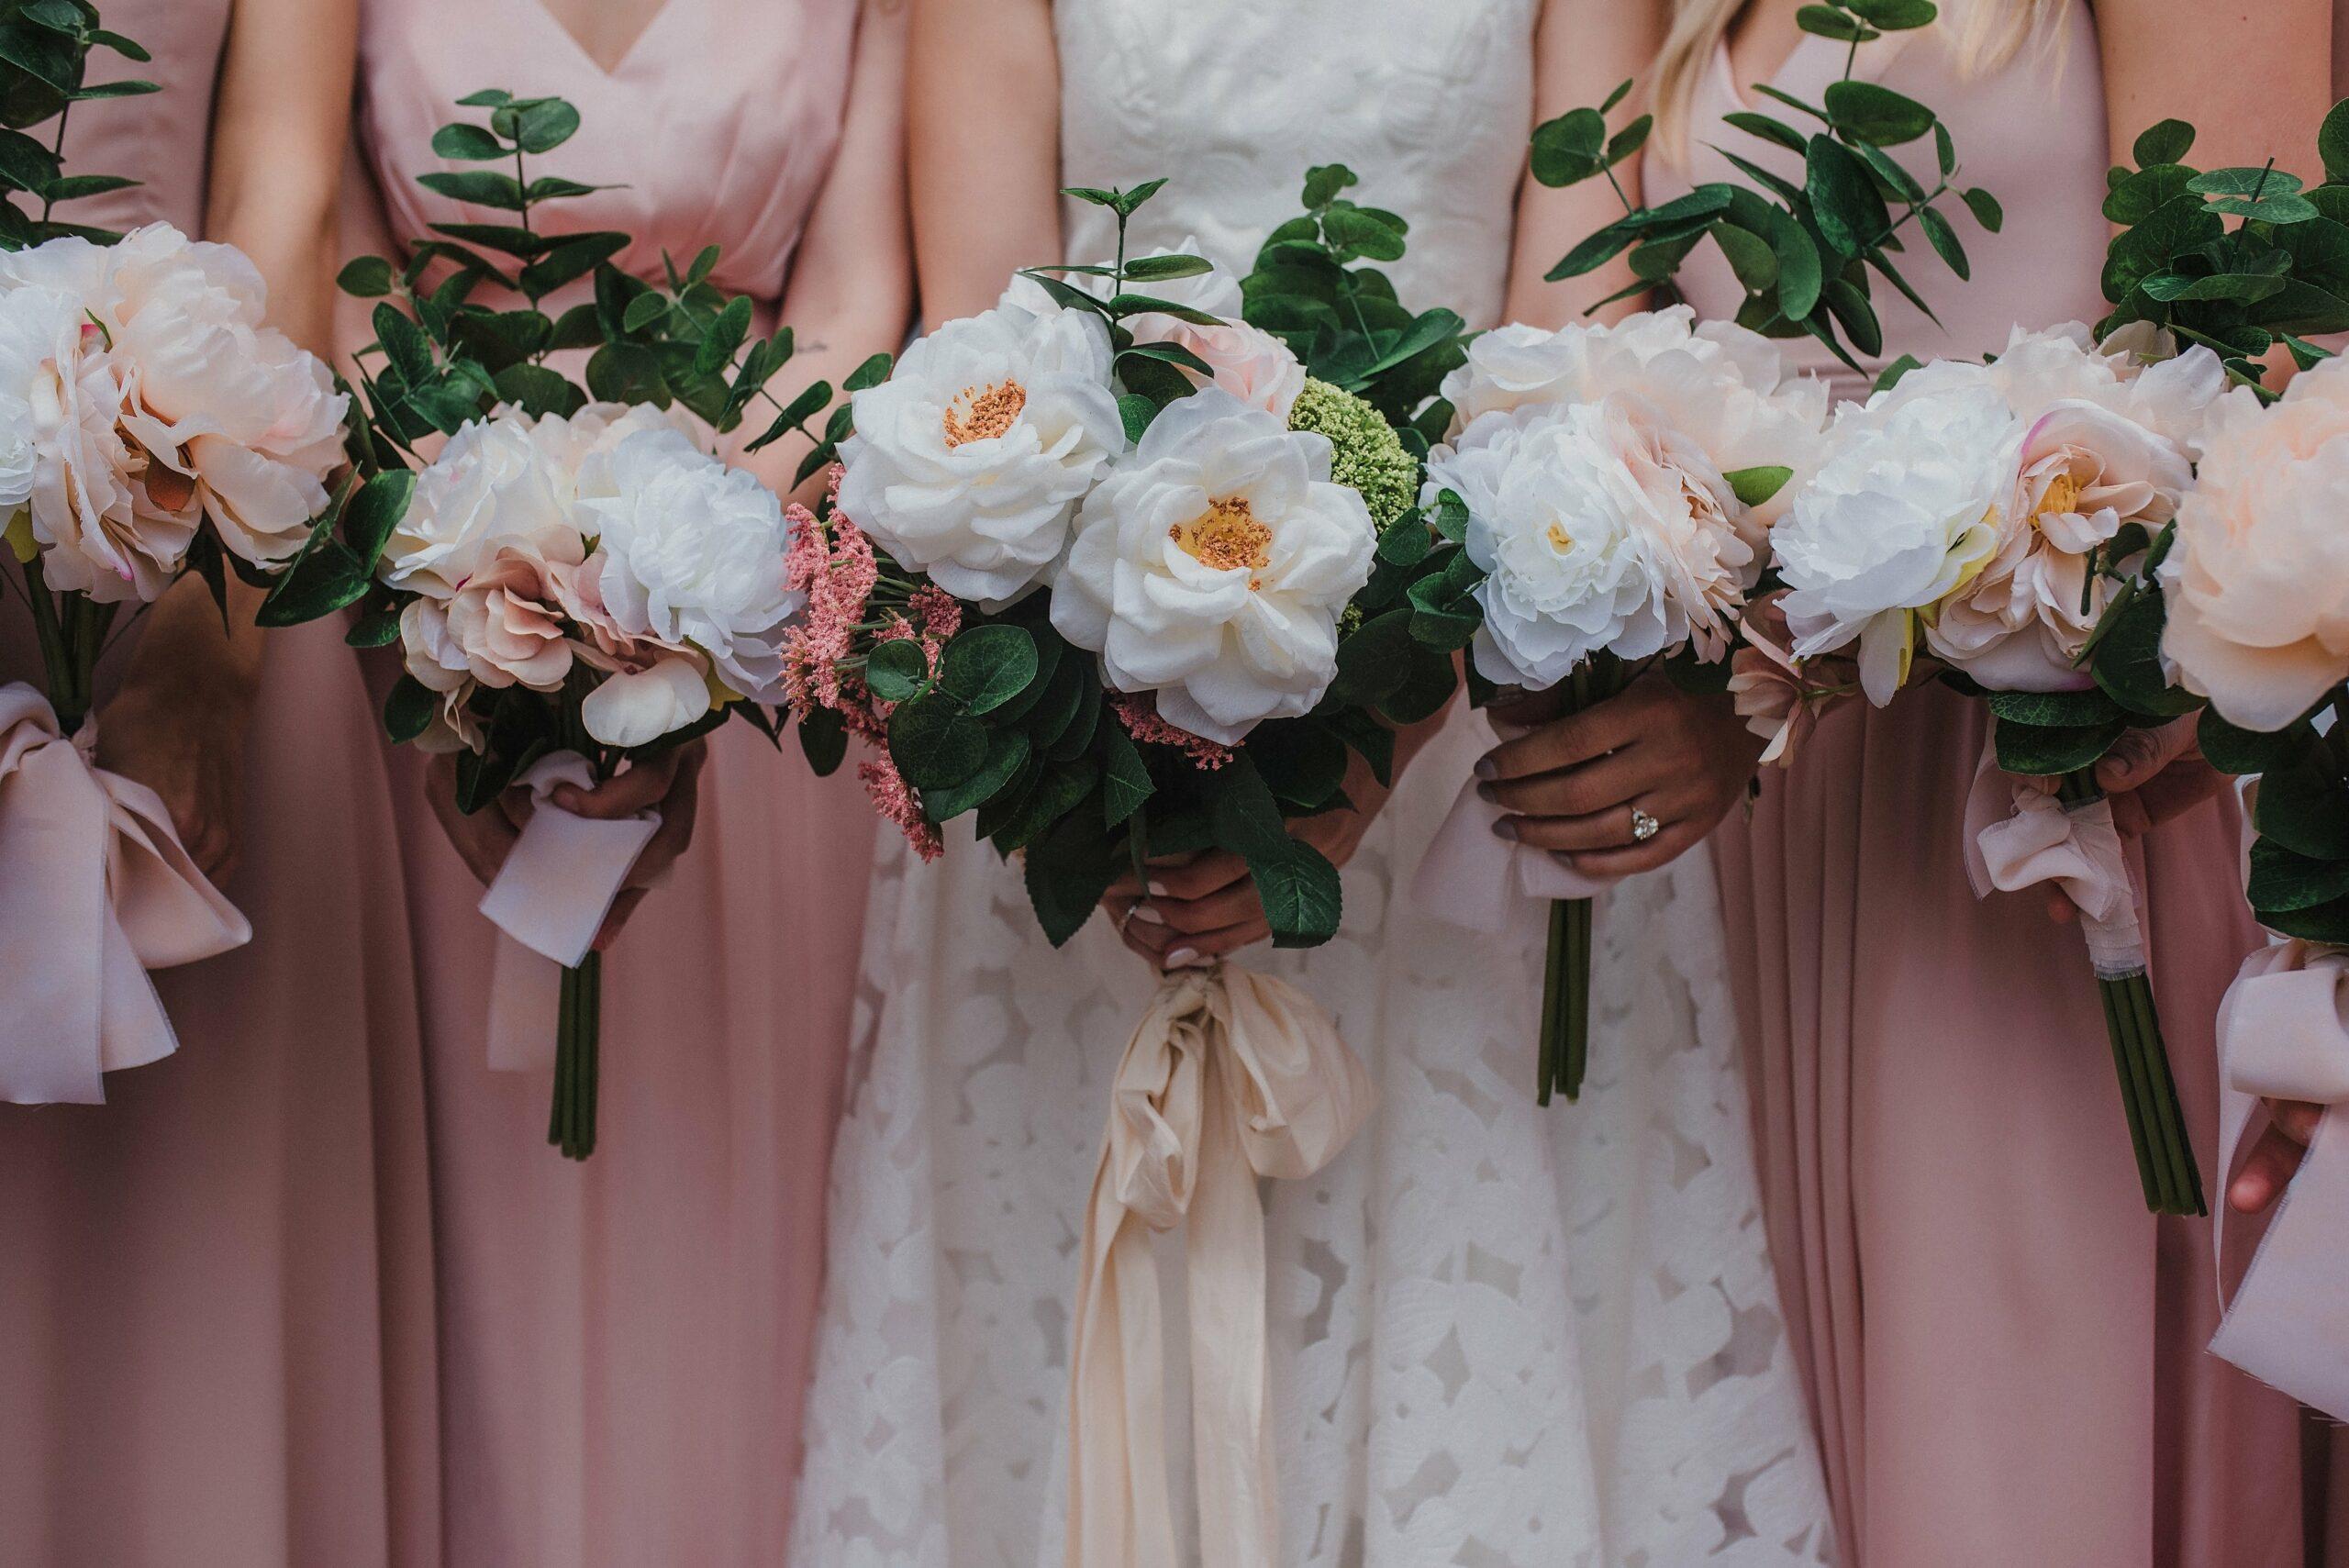 28SEP19-NadiaAndrew-WeddingParty-048